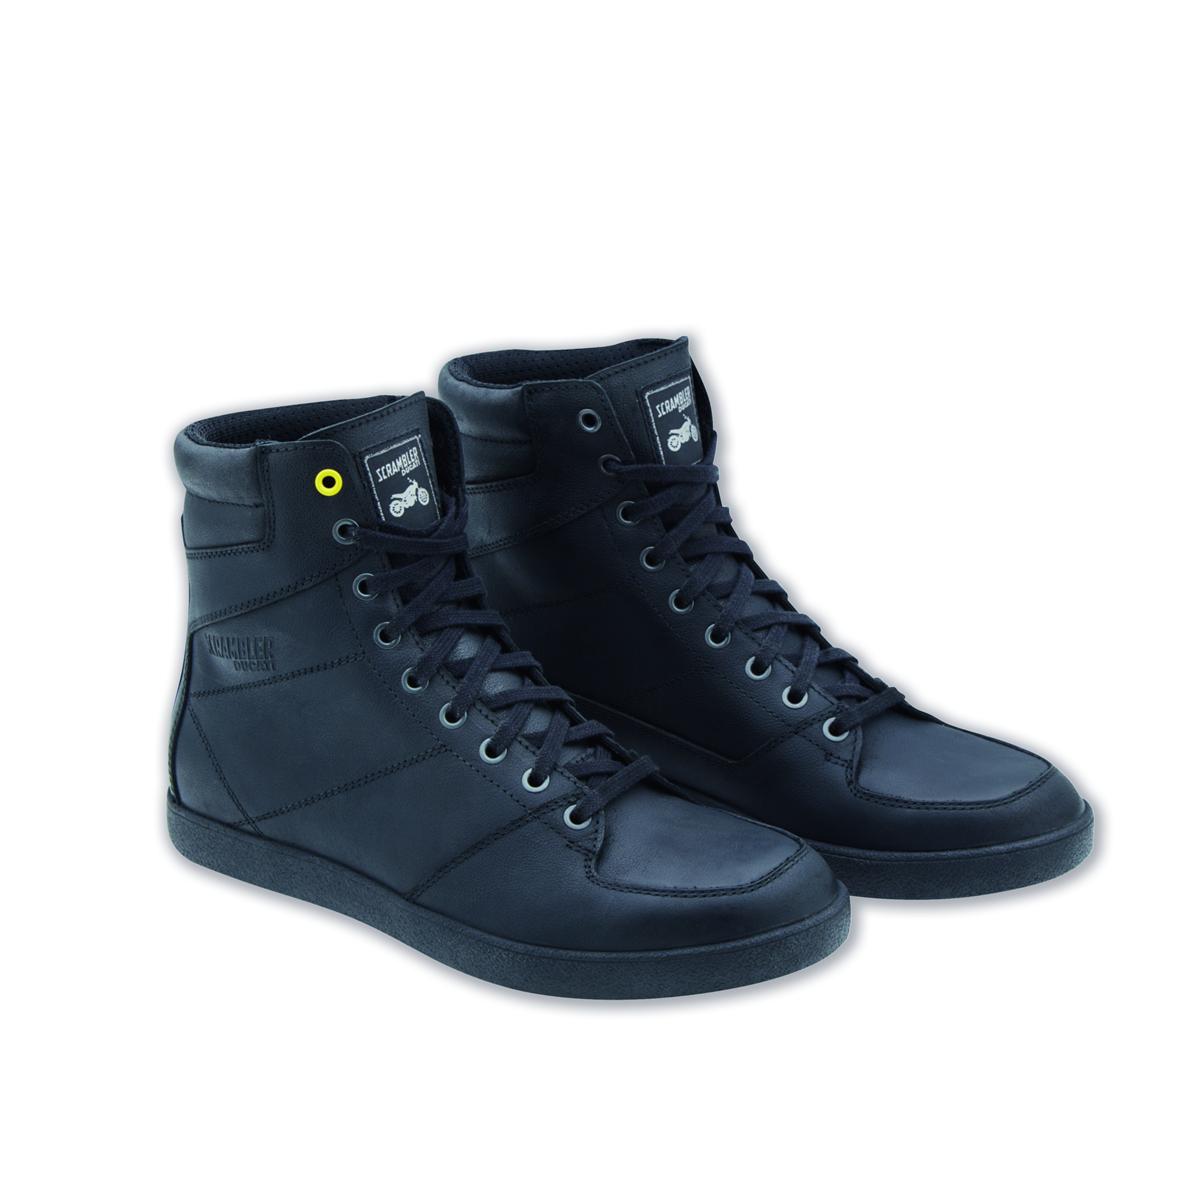 Black Rider - Technical short boots 981040337